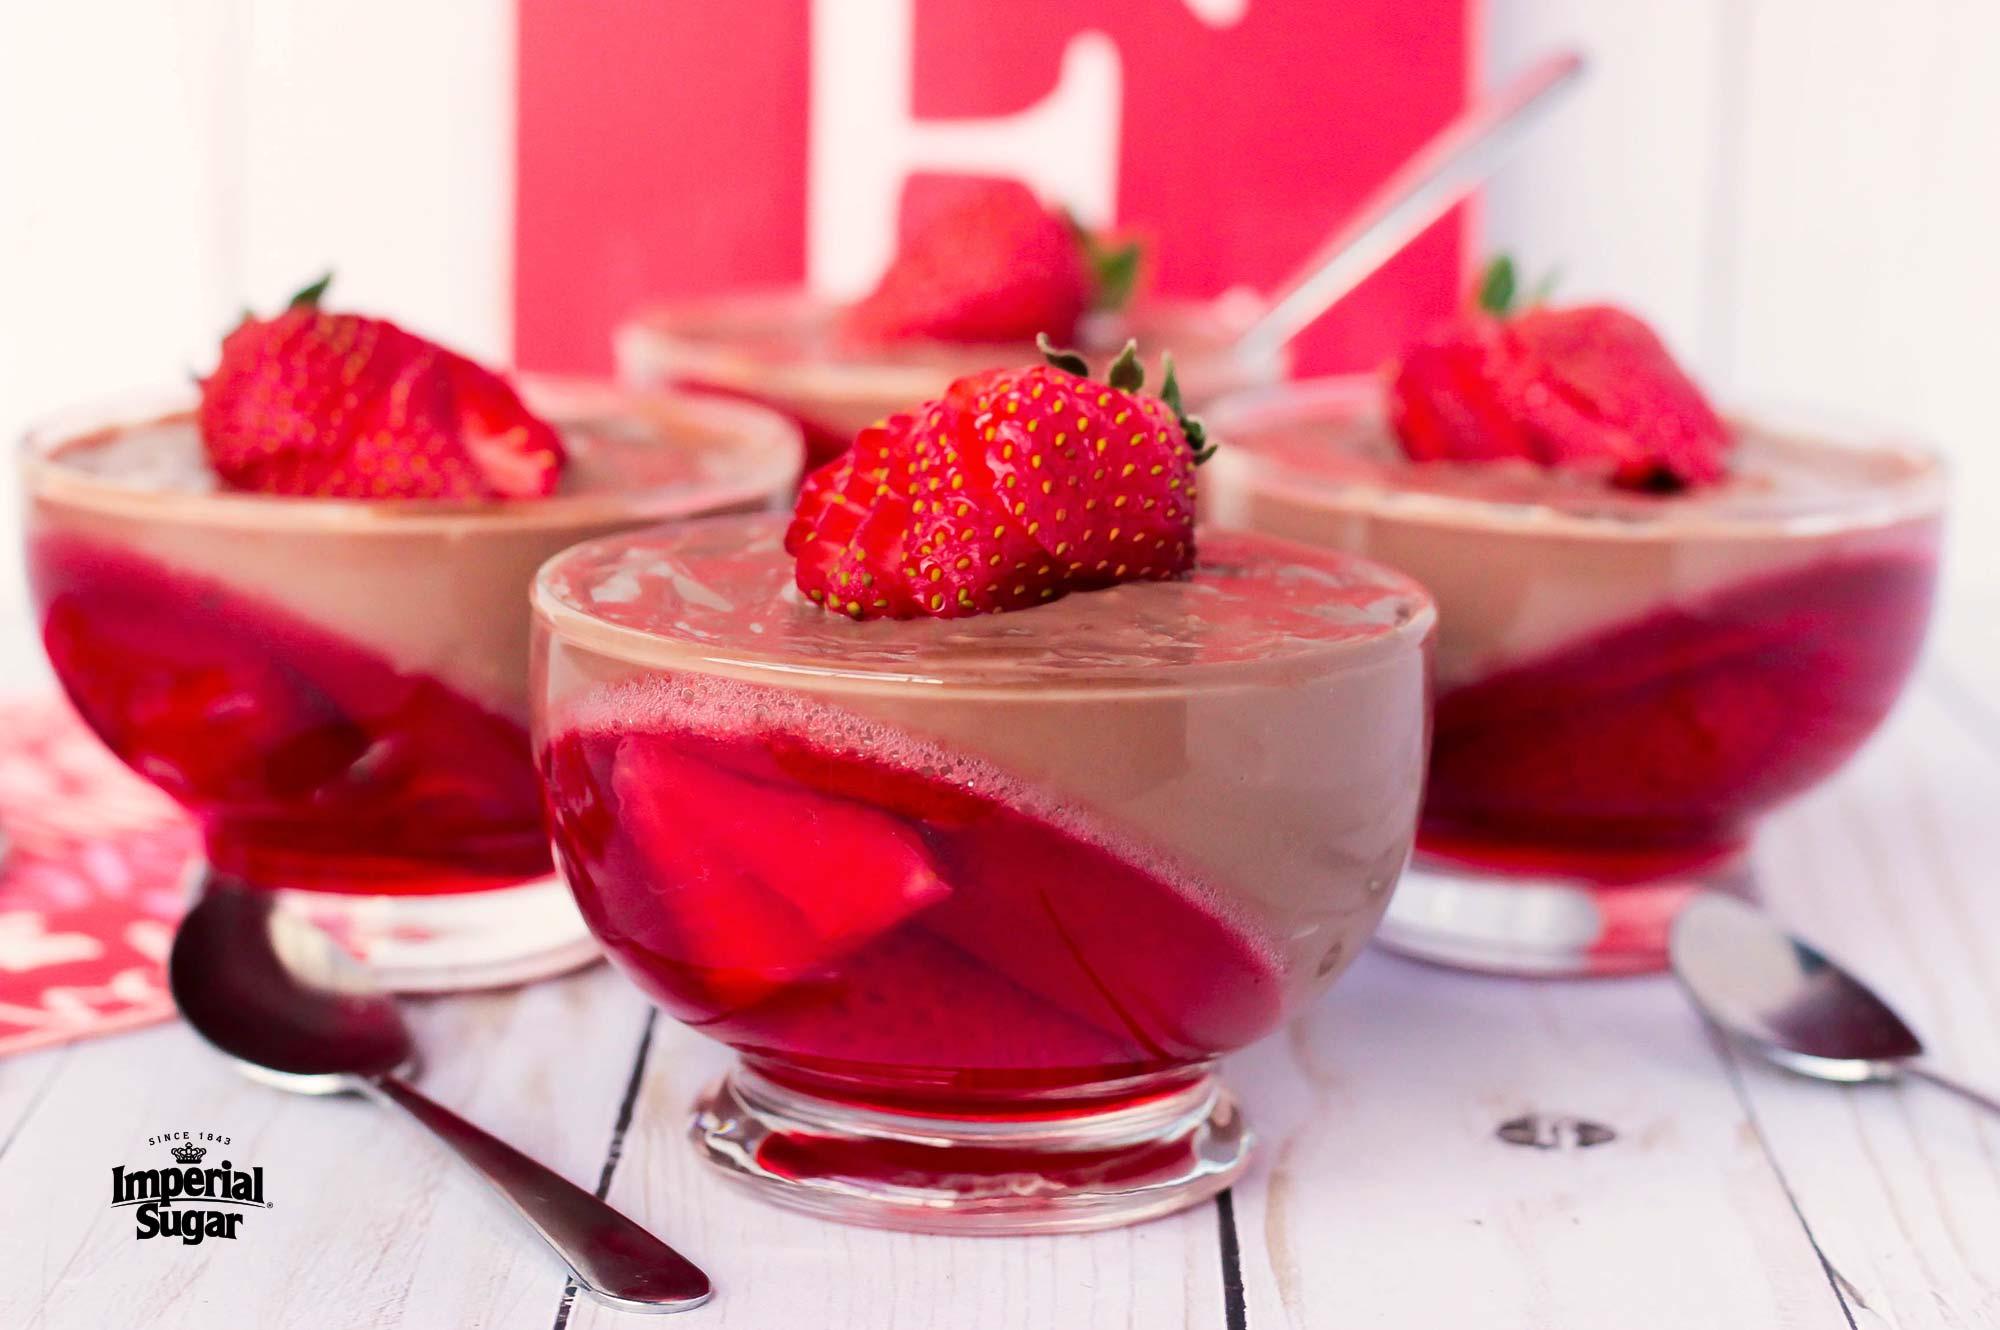 dessert recipes with jello pudding Chocolate Pudding and Strawberry Jello Parfaits